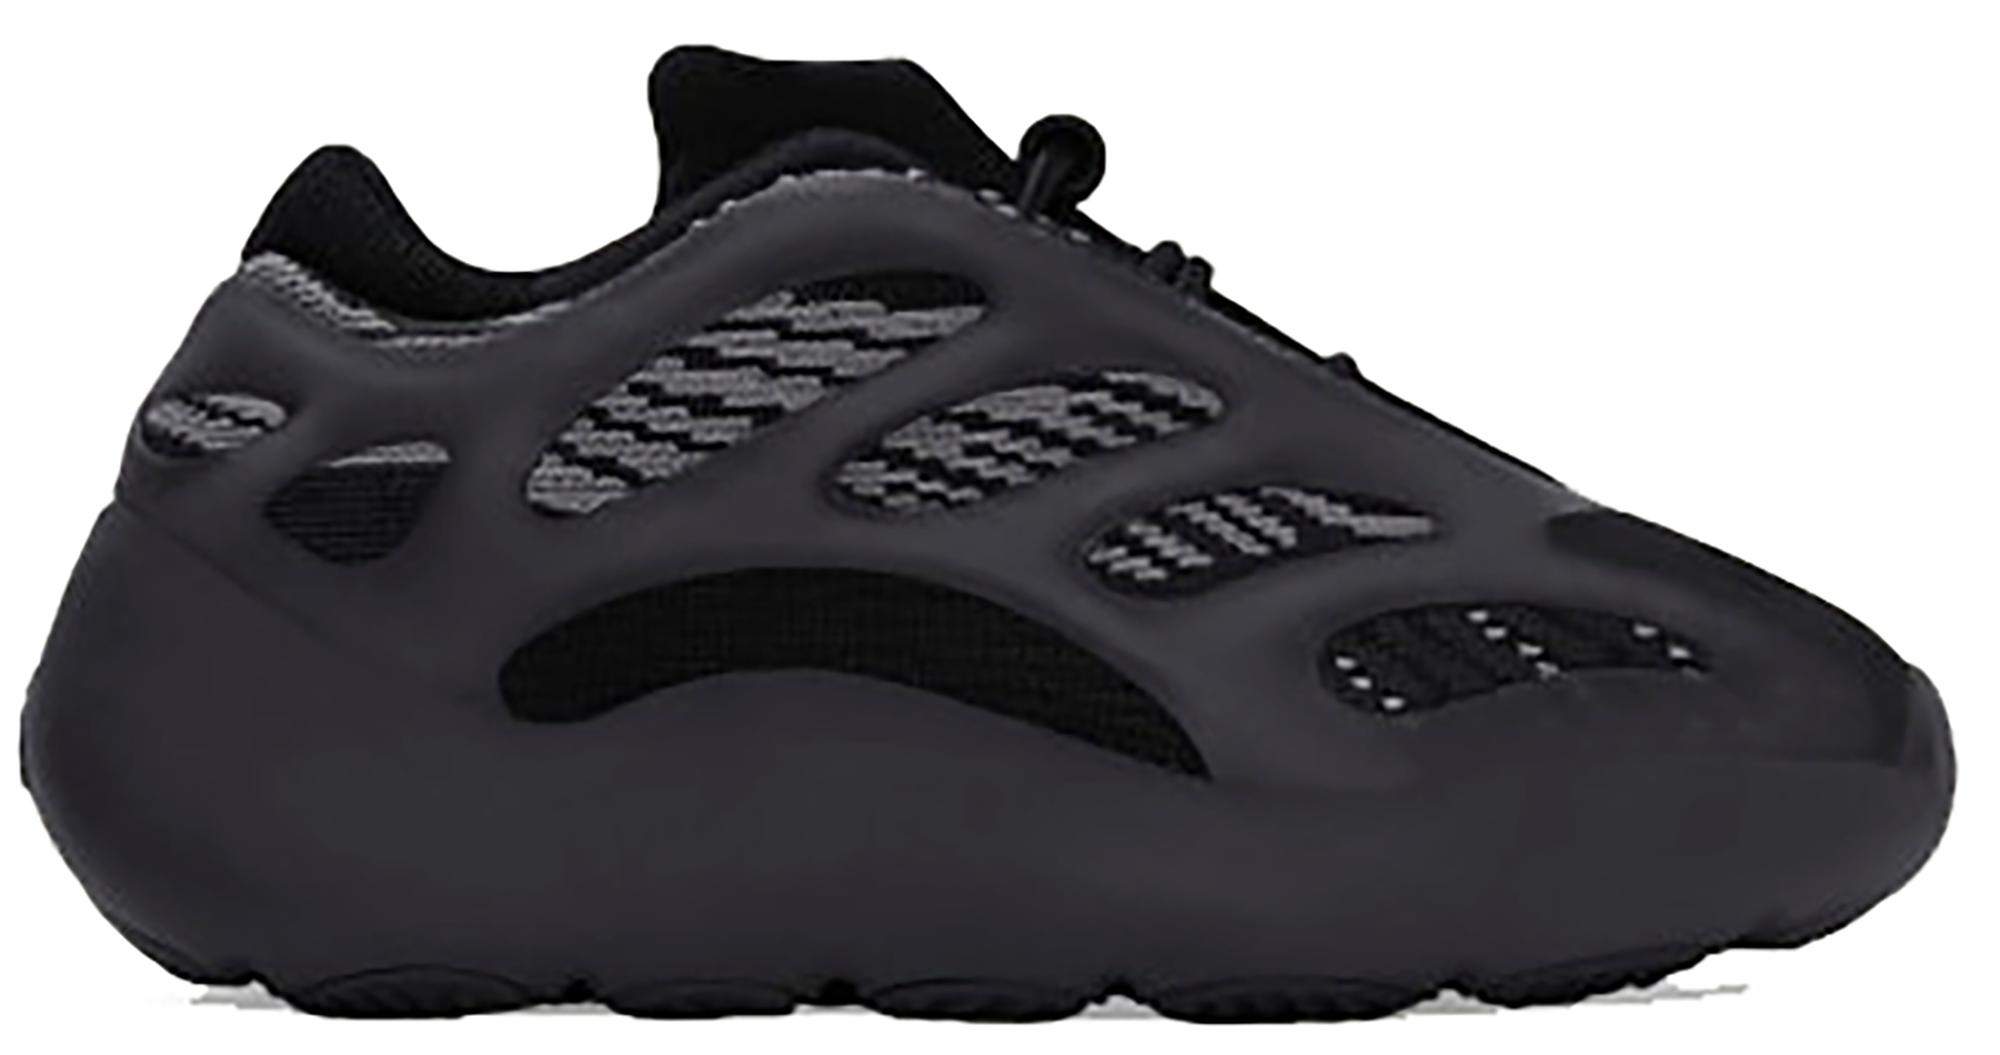 adidas Yeezy 700 V3 Alvah (Infant) - H67801